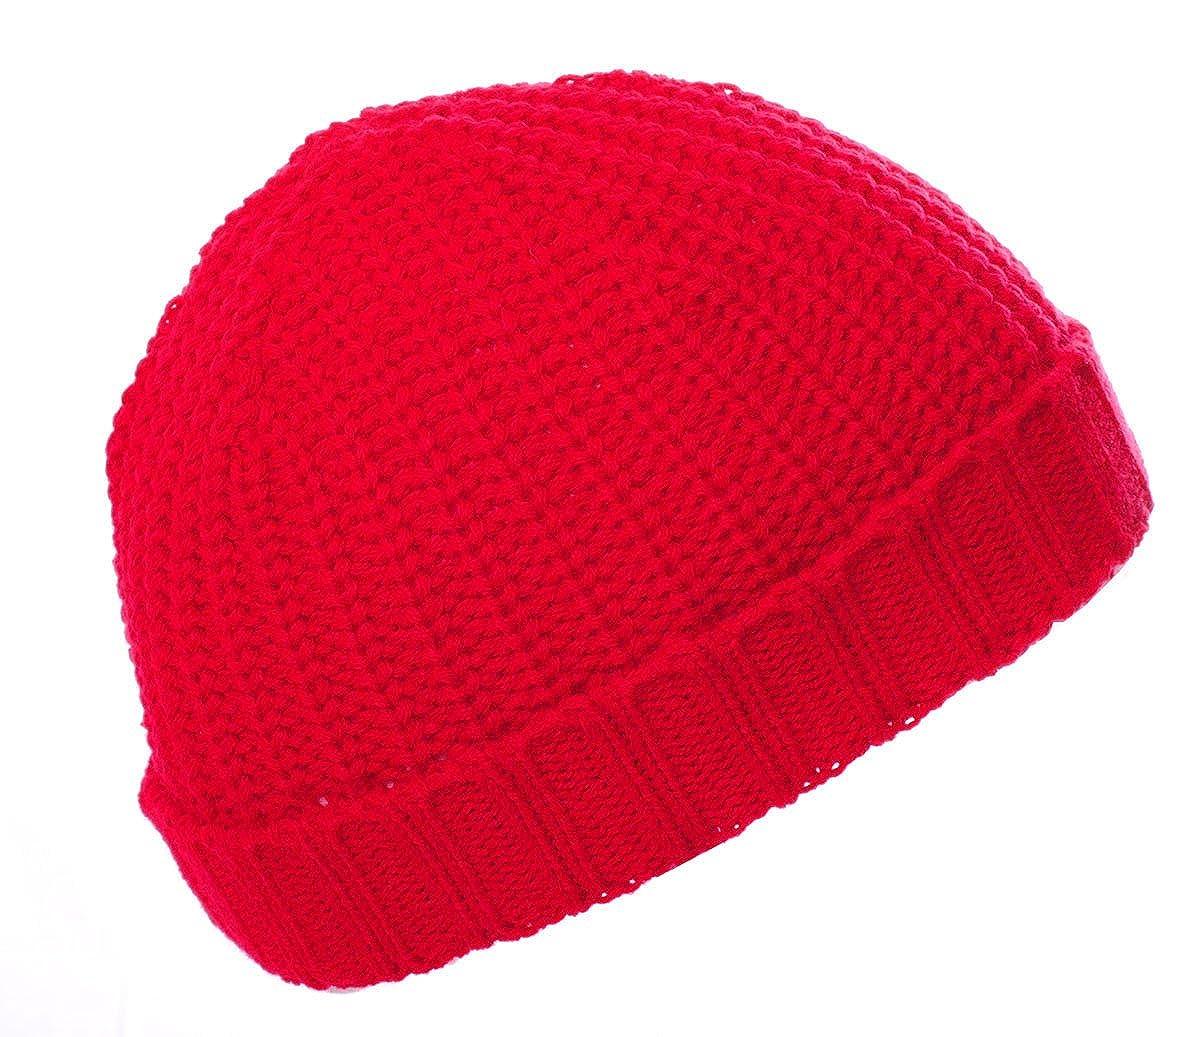 100% Acrylic Kids Children's Knitted Beanie Hat, Snug Ski Hats Made in England Snug Ski Hats Made in England (Blue)